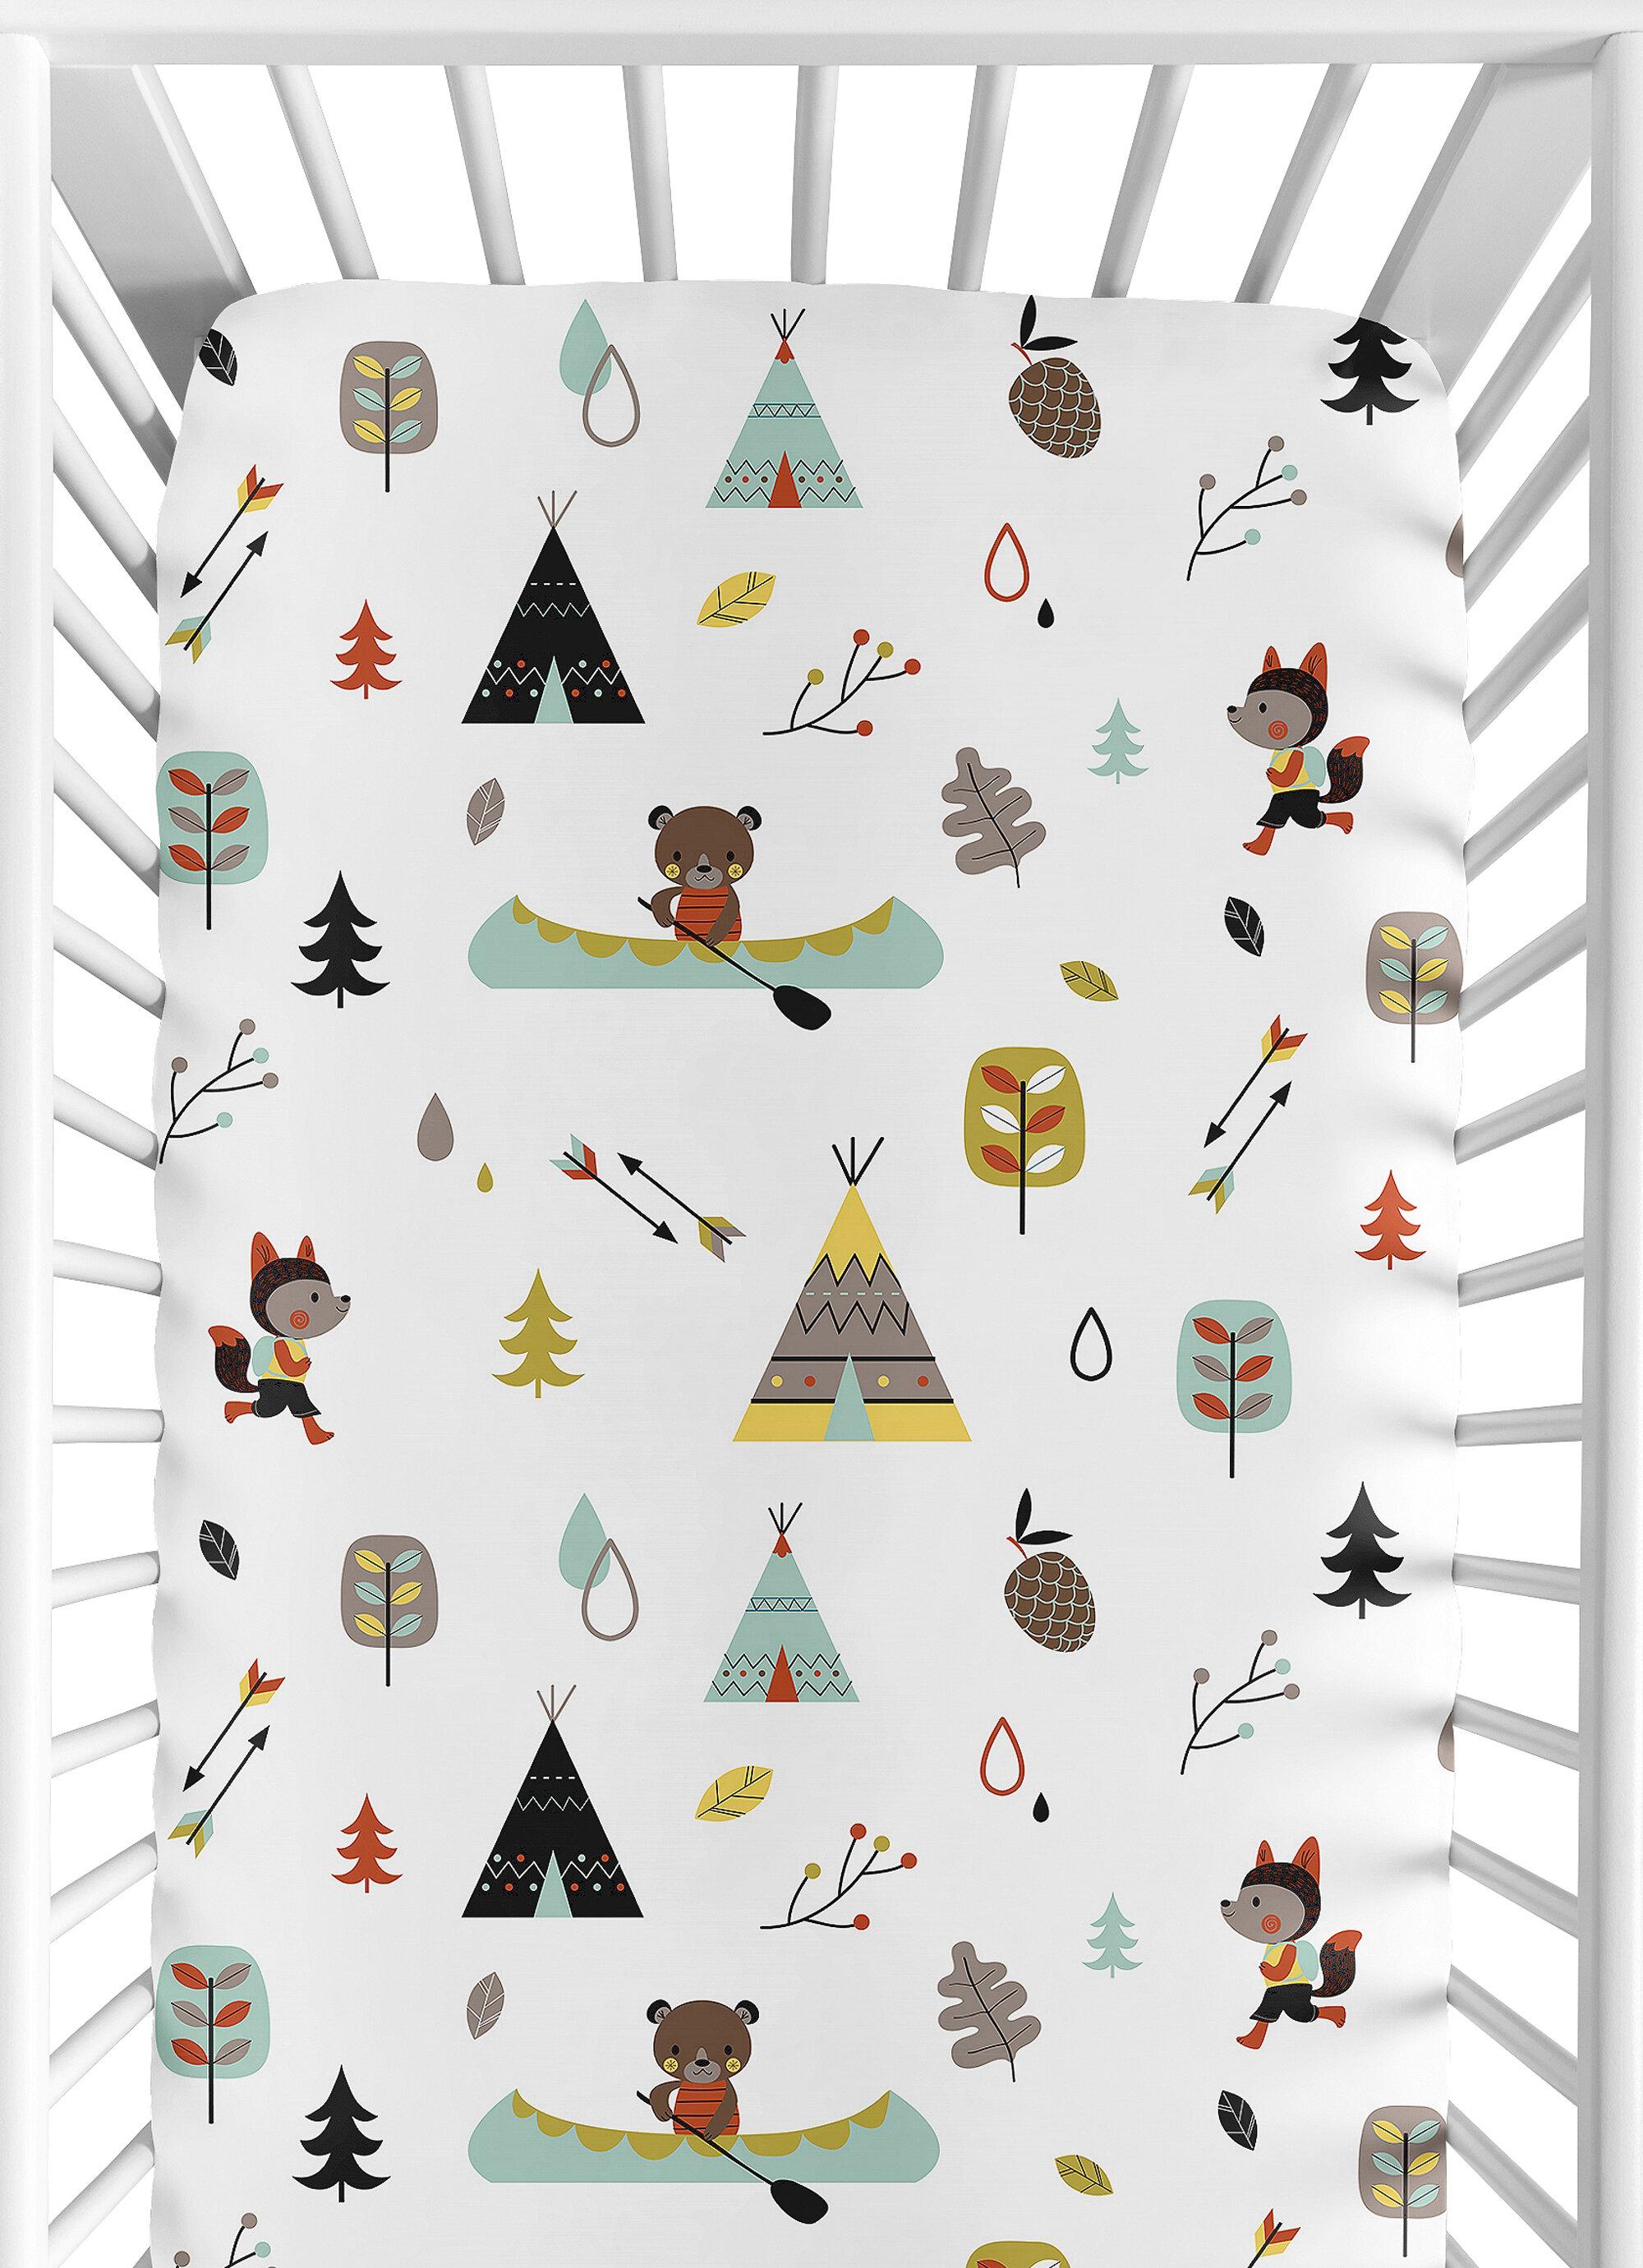 Sweet Jojo Designs Outdoor Adventure Fitted Crib Sheet Reviews Wayfair